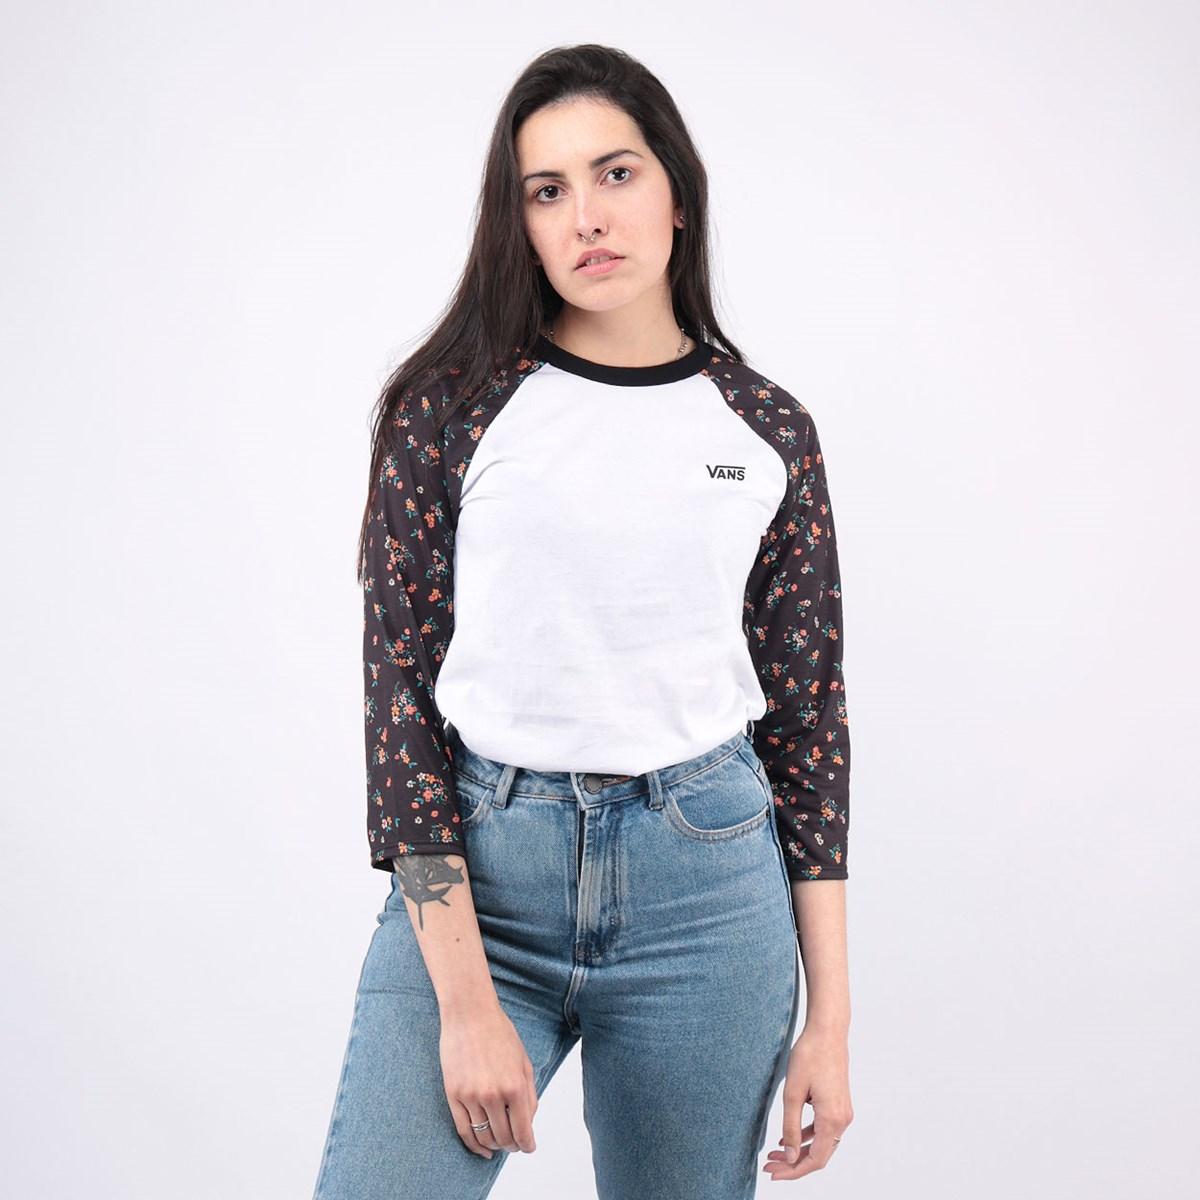 Camiseta Vans Feminina Tay Luh Raglan White Beauty Floral VN0A4N5LZKN